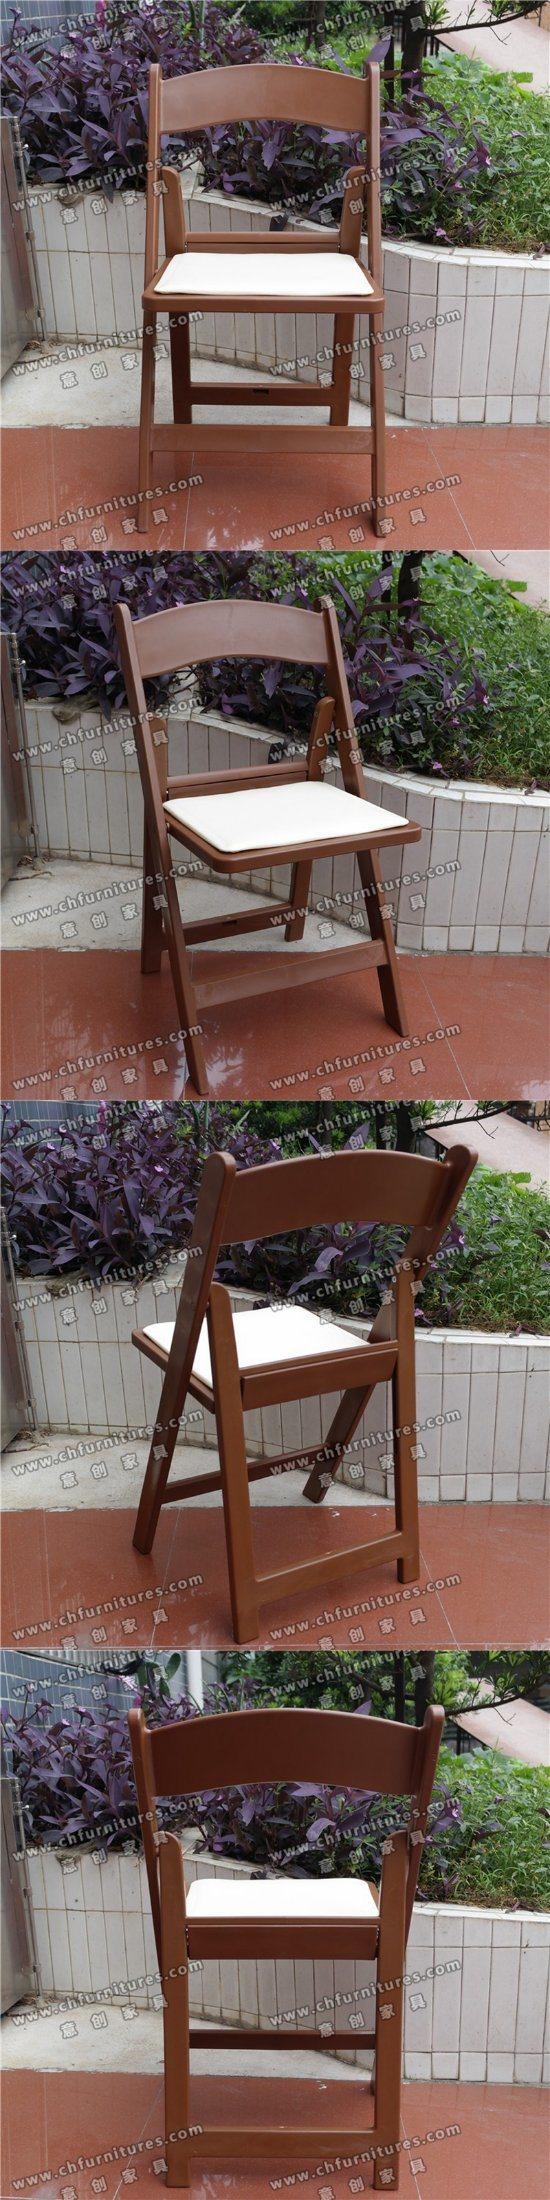 Modern Plastic Folding Garden Chair Yc-P12